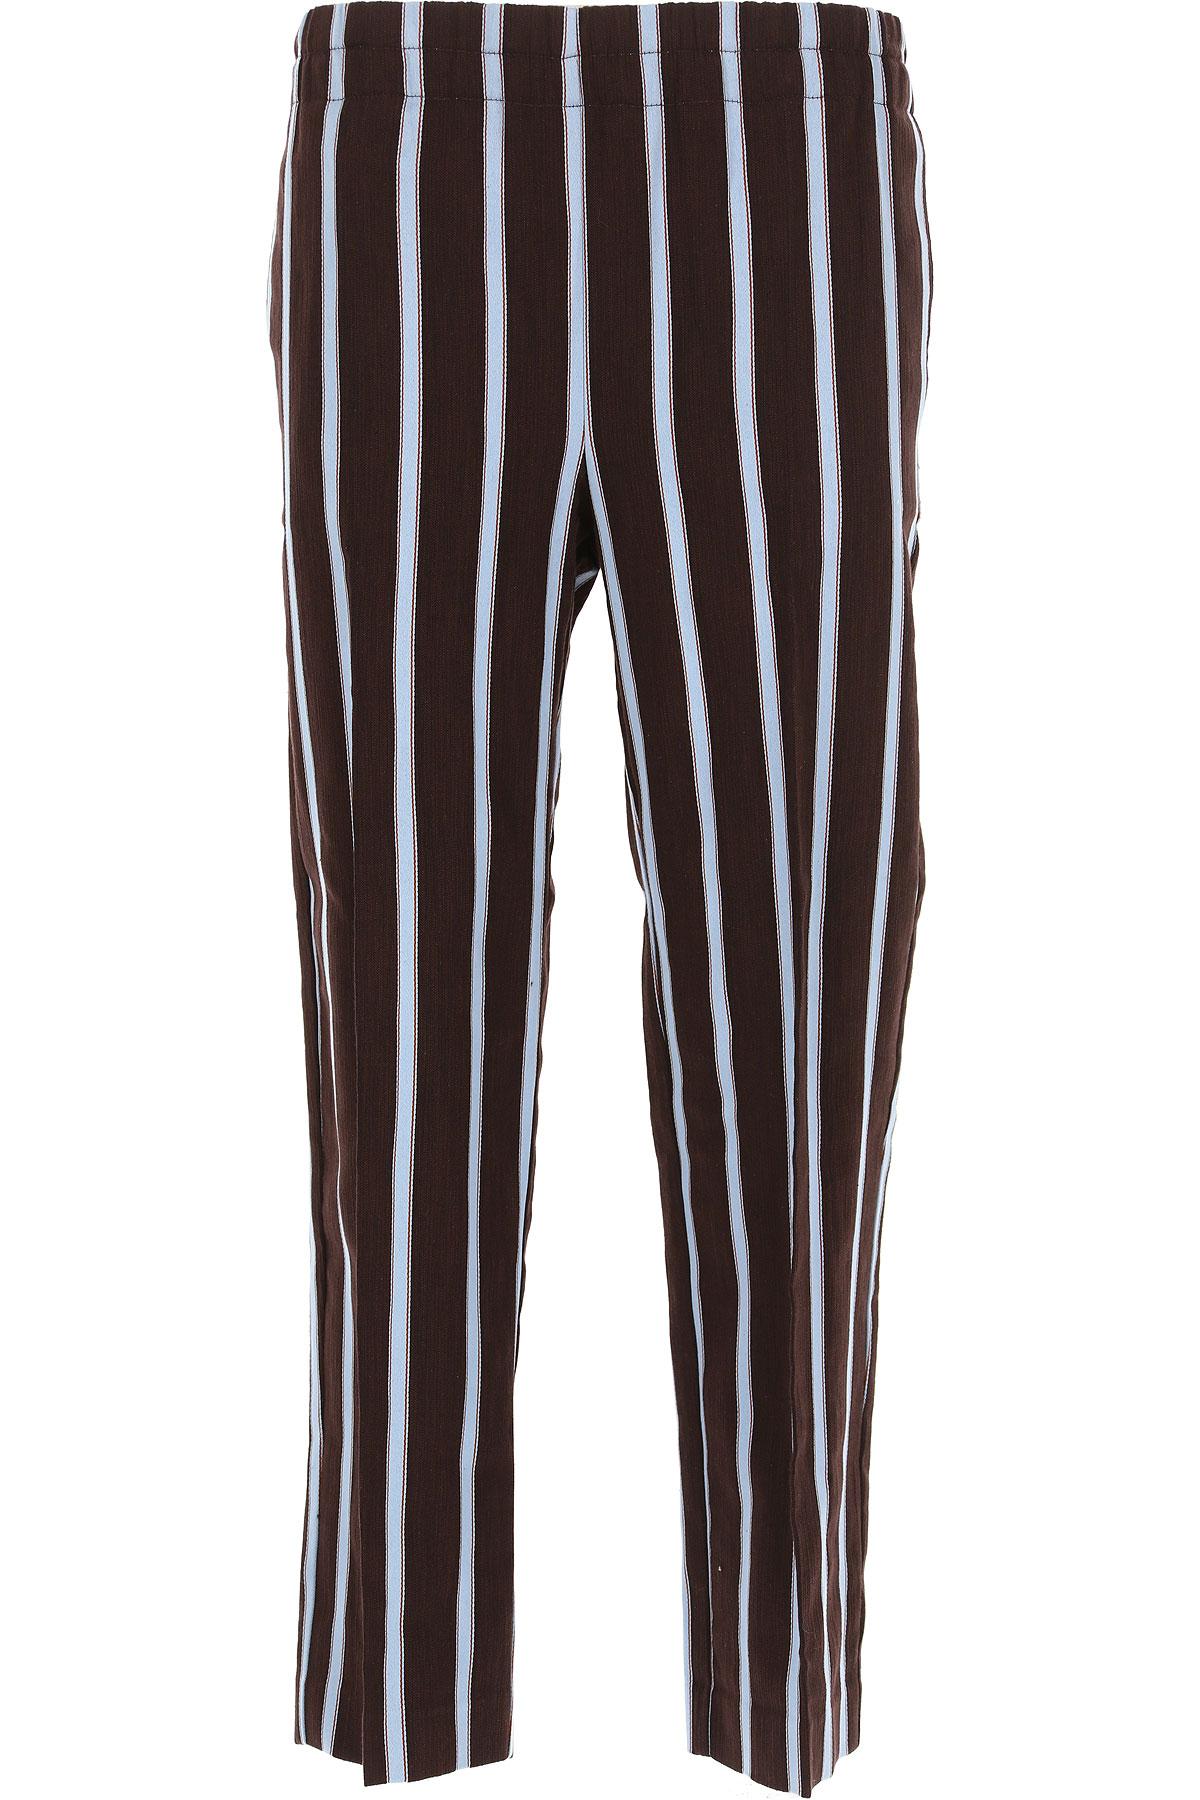 Image of Jucca Pants for Women On Sale, Moka, Cotton, 2017, 26 28 30 32